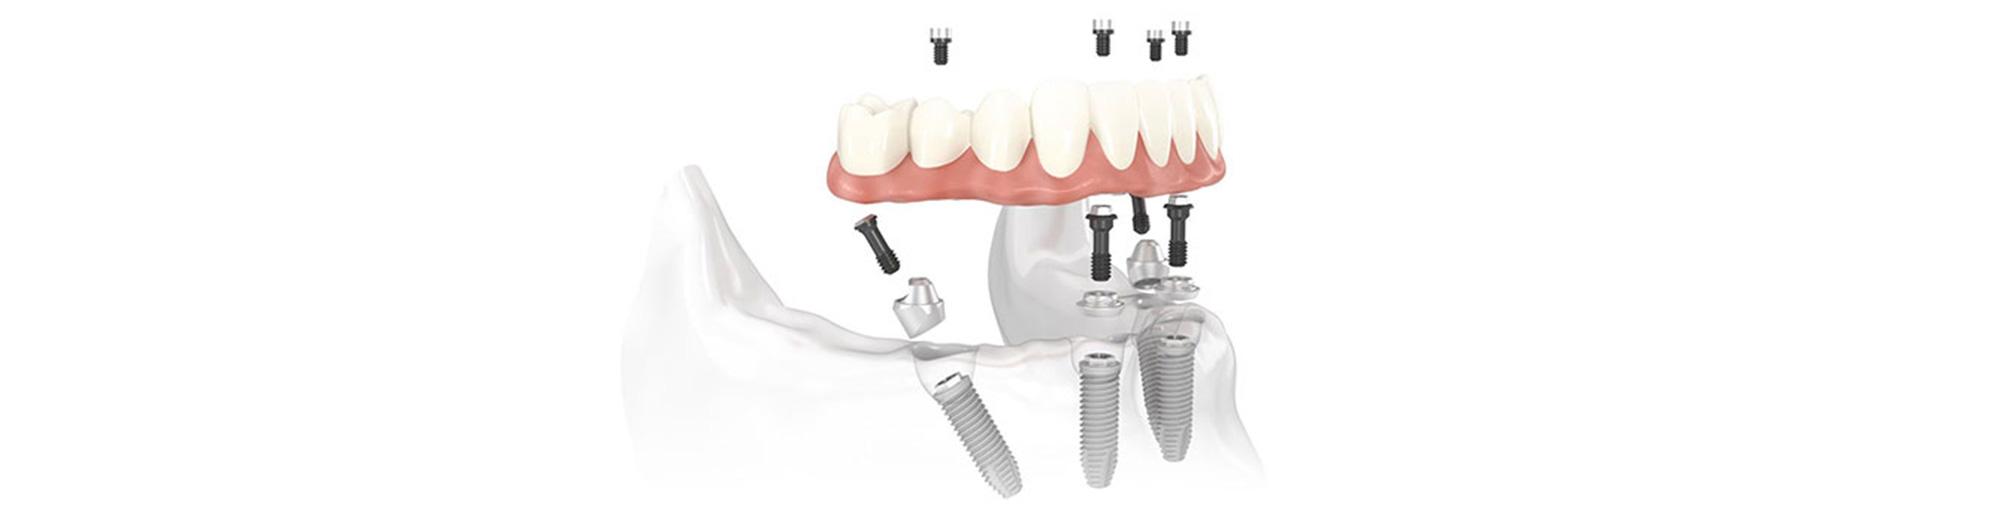 Dental Implants Charlotte